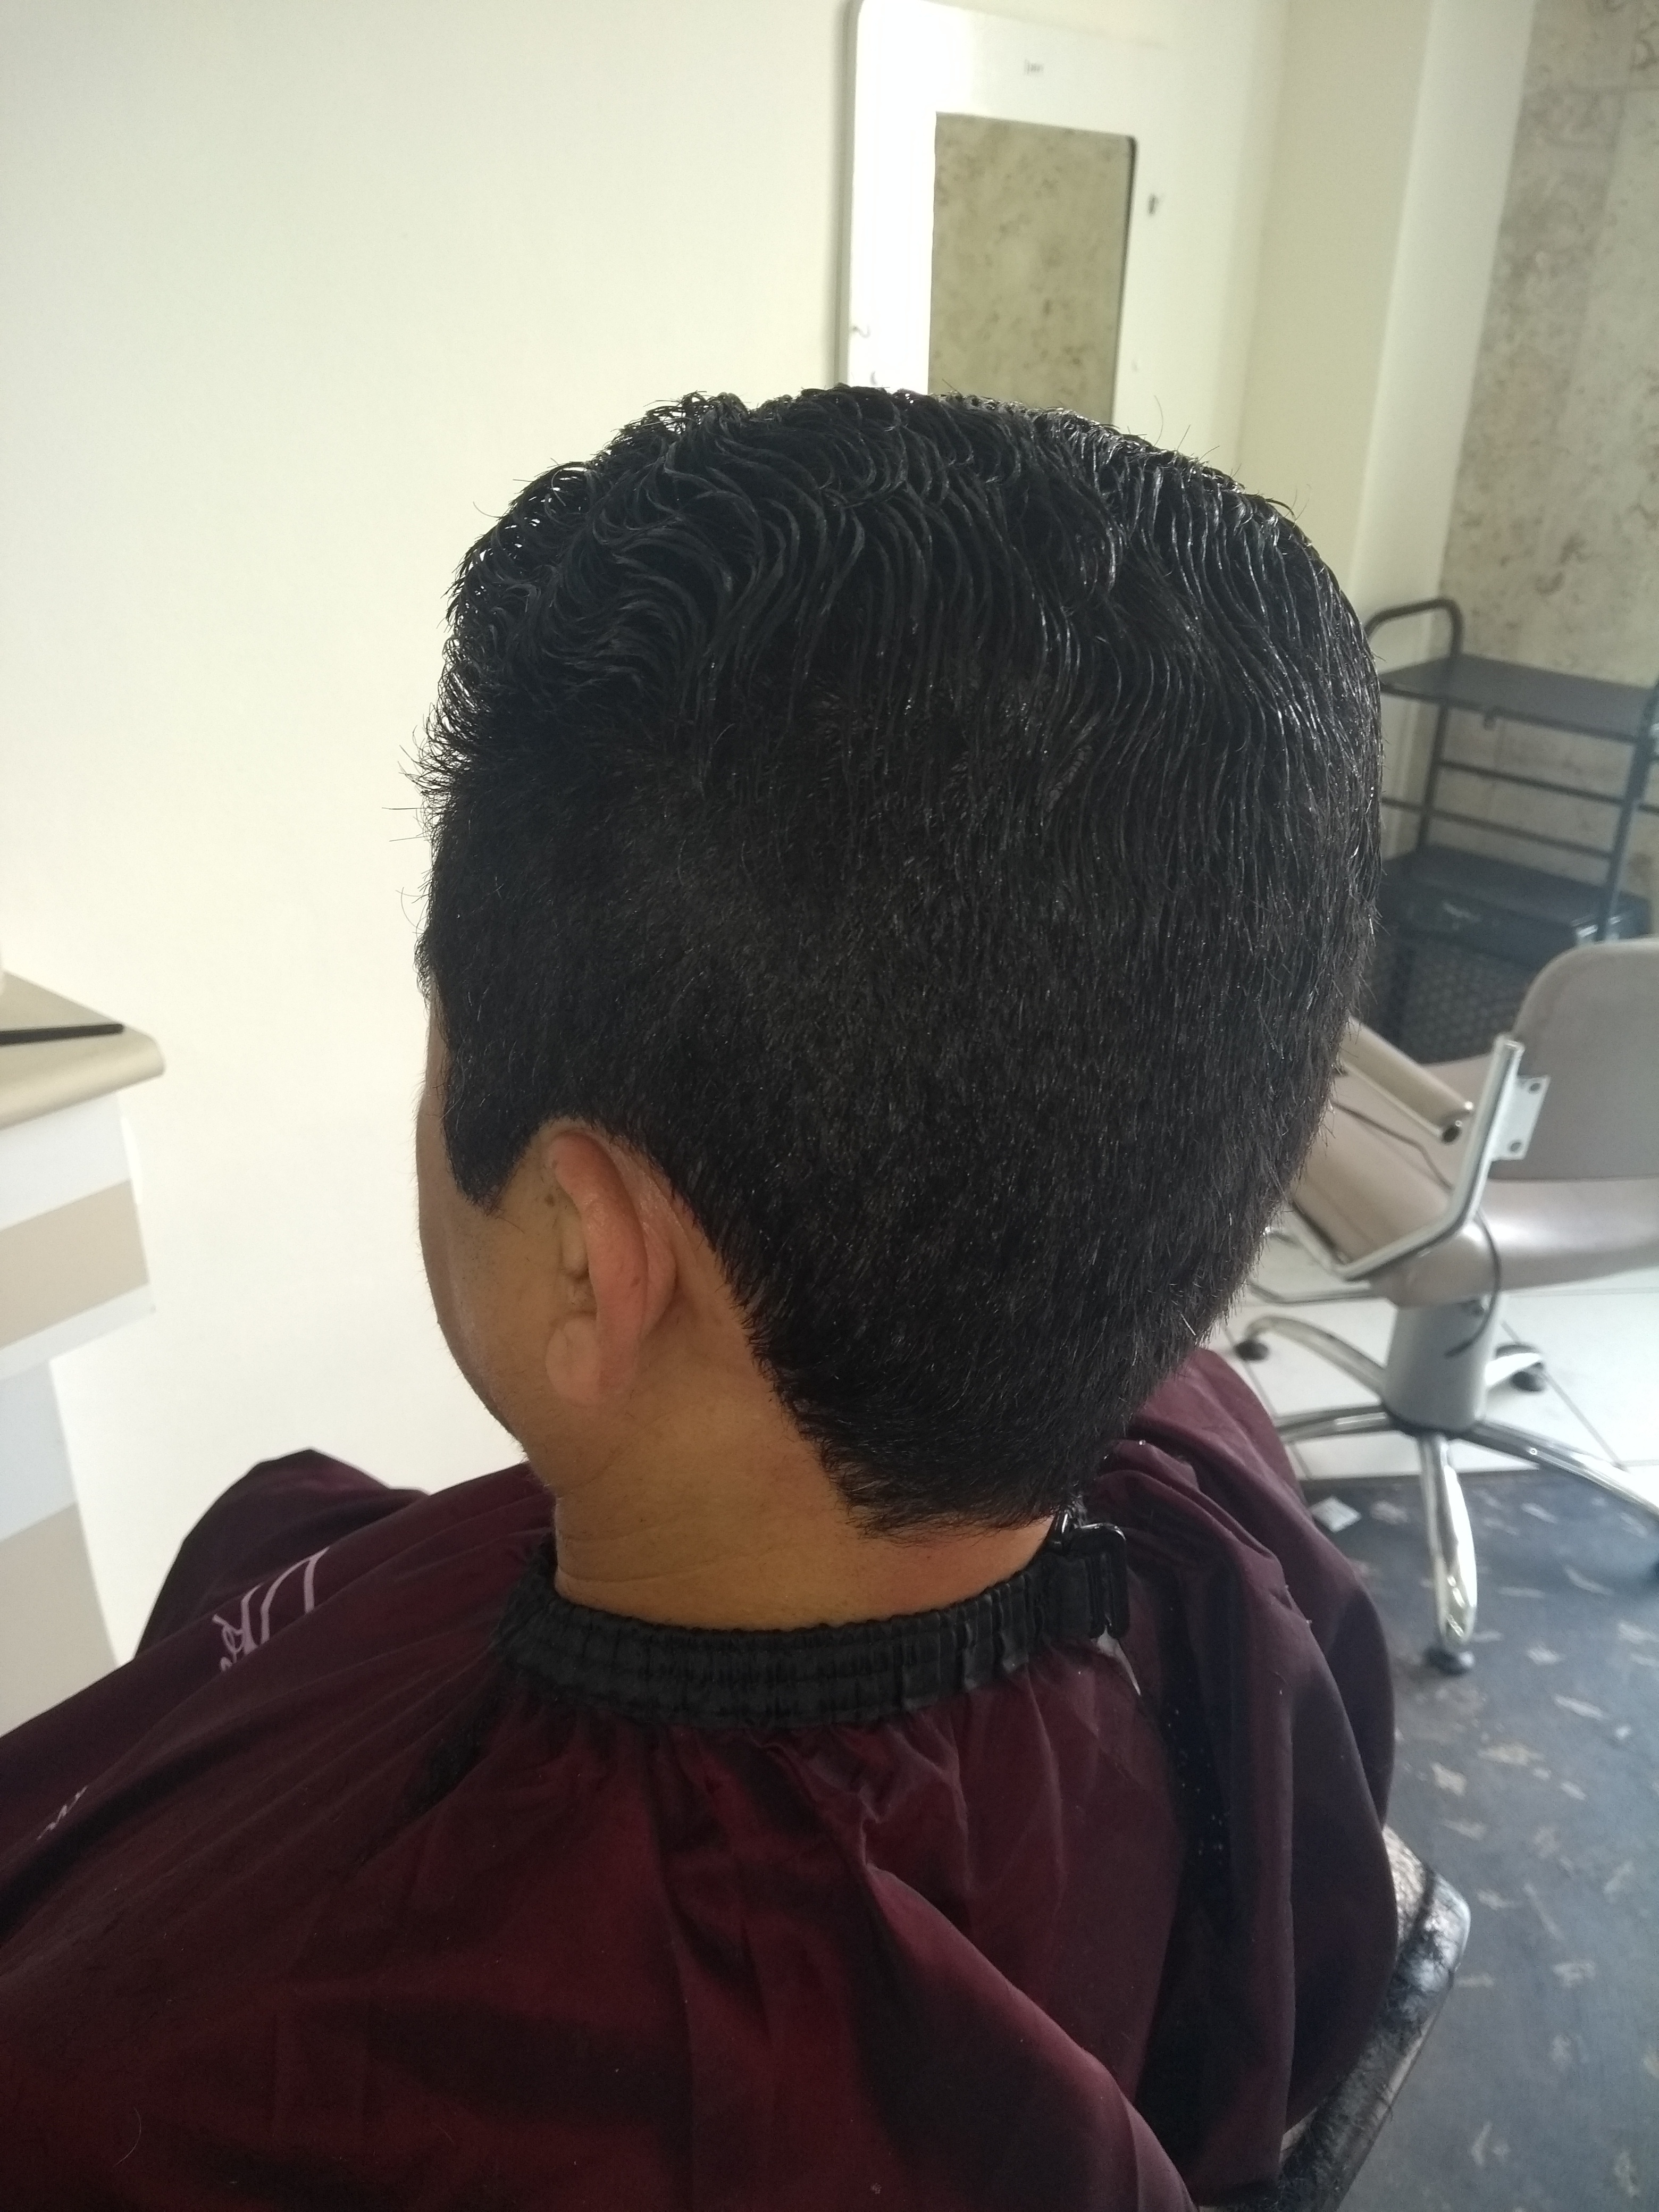 Corte masculino cabelo cabeleireiro(a) manicure e pedicure